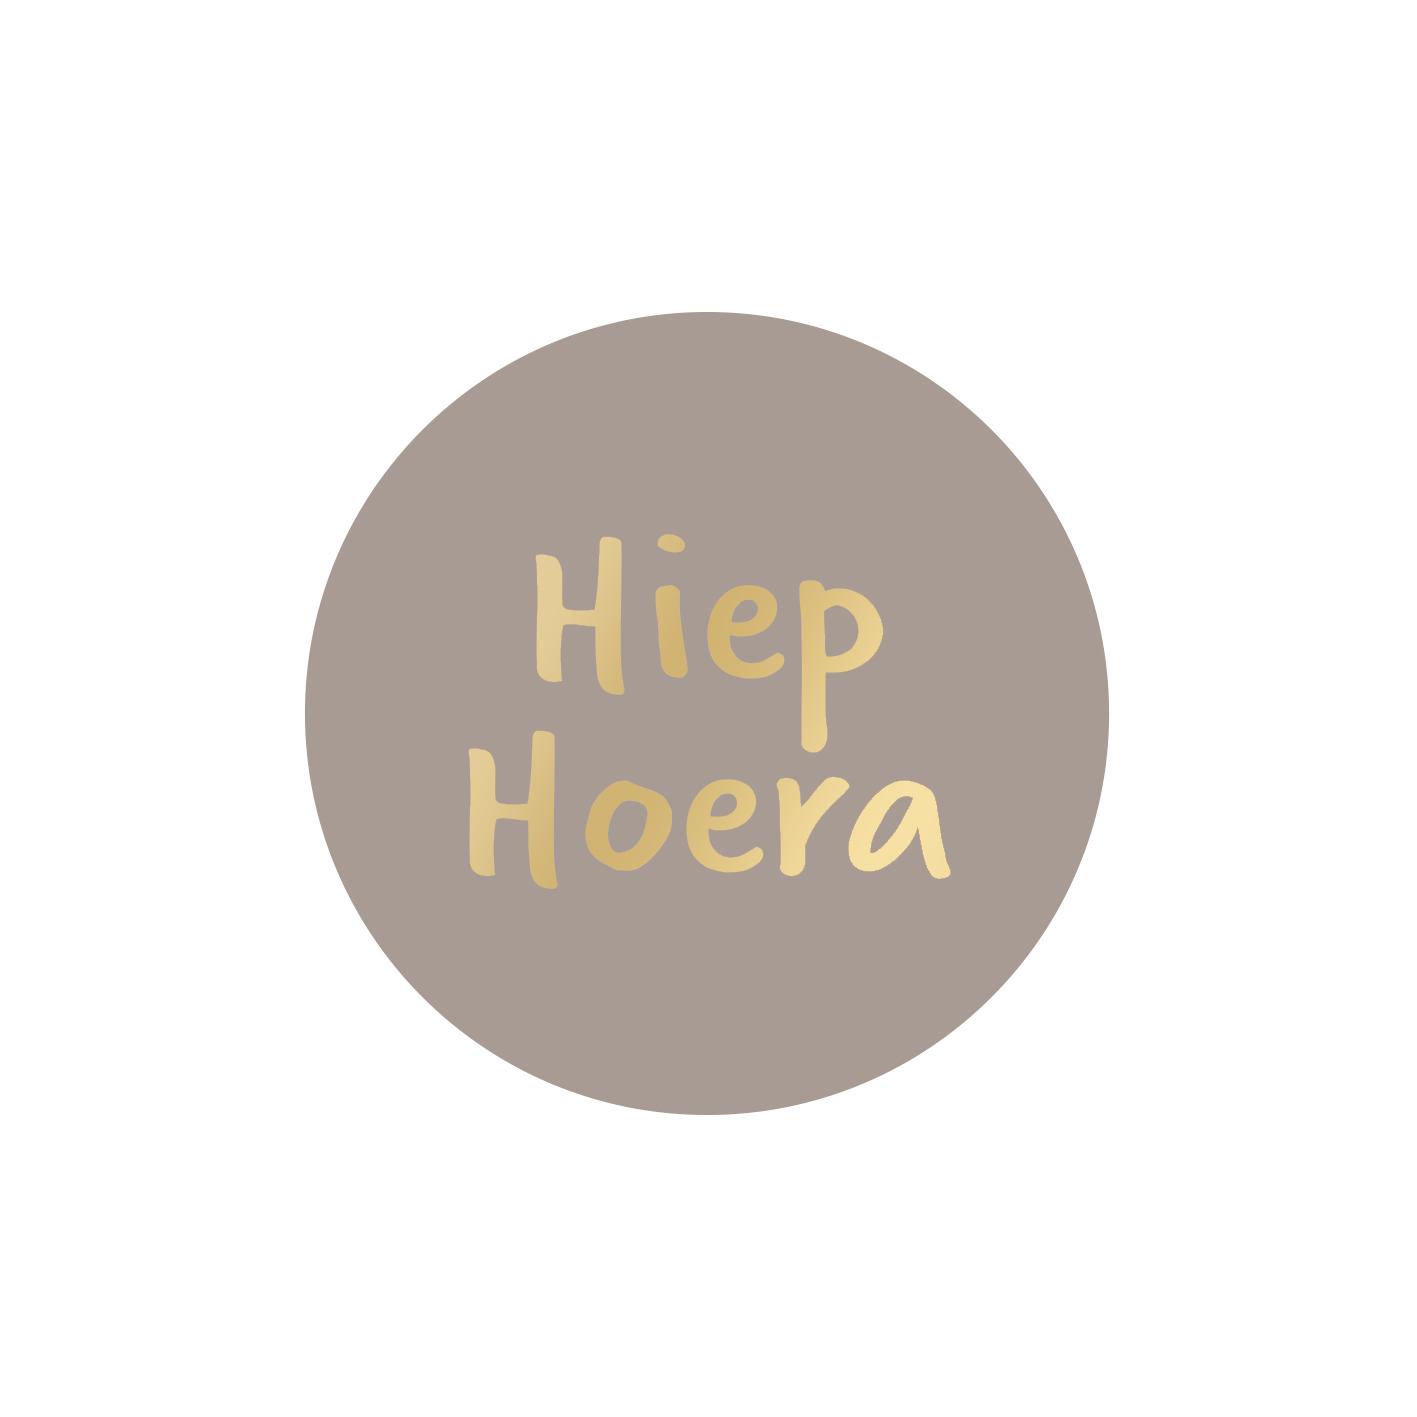 Sticker Hiep Hoera